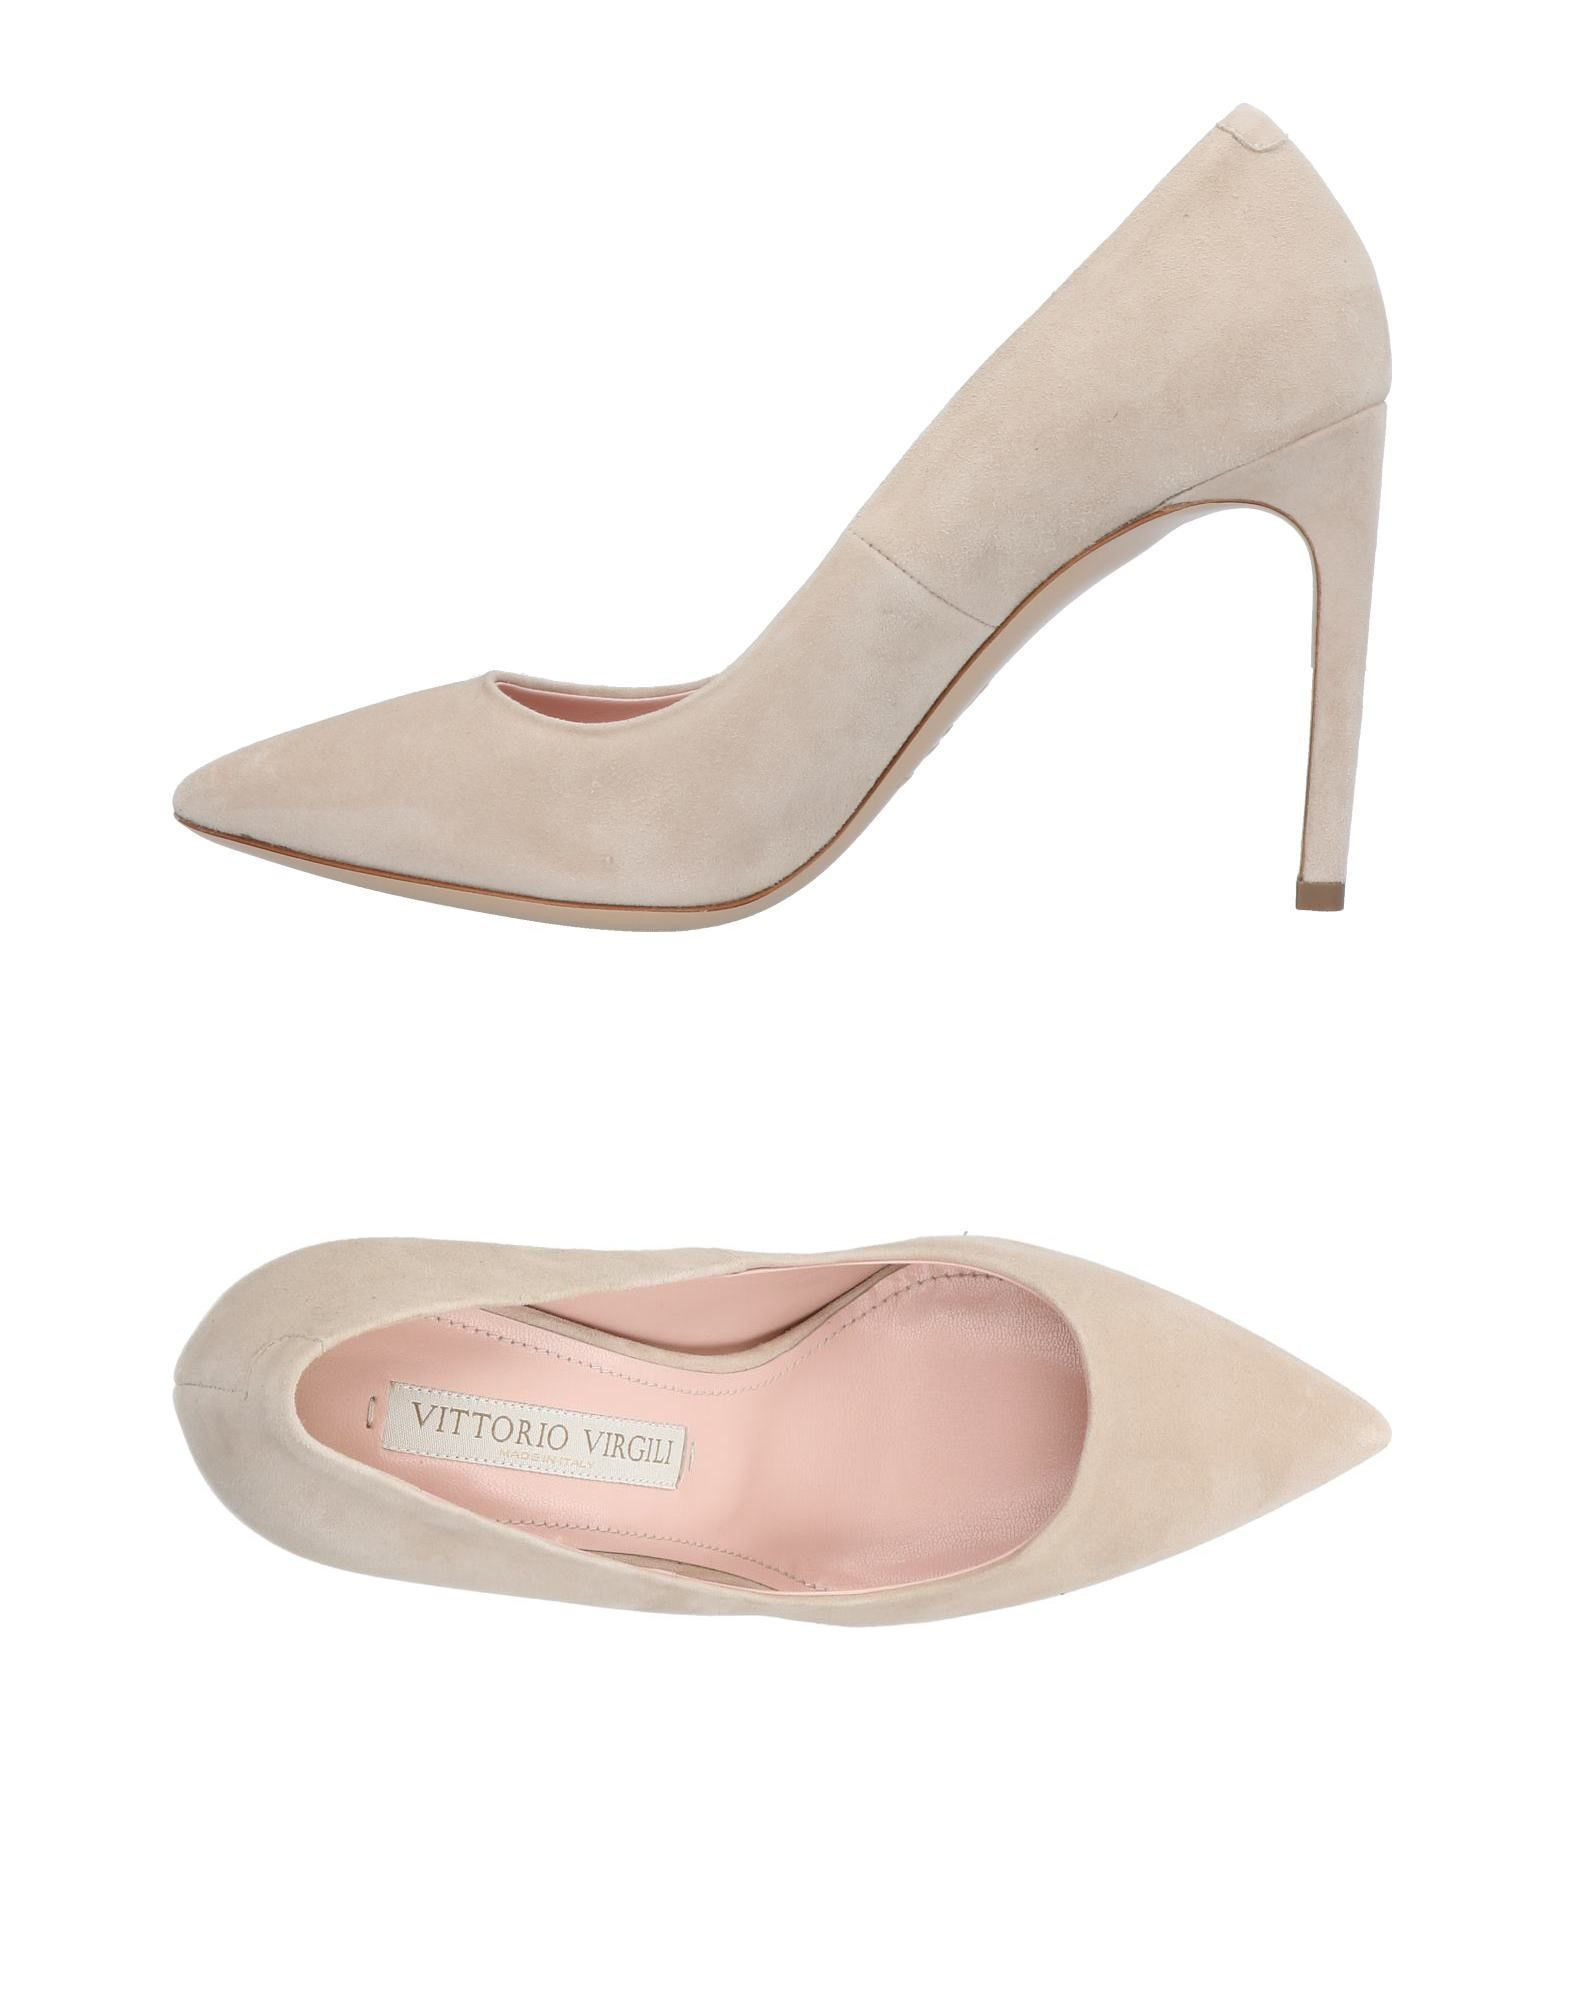 Descuento Vittorio de la marca Zapato De Salón Vittorio Descuento Virgili Mujer - Salones Vittorio Virgili  Beige b435a0